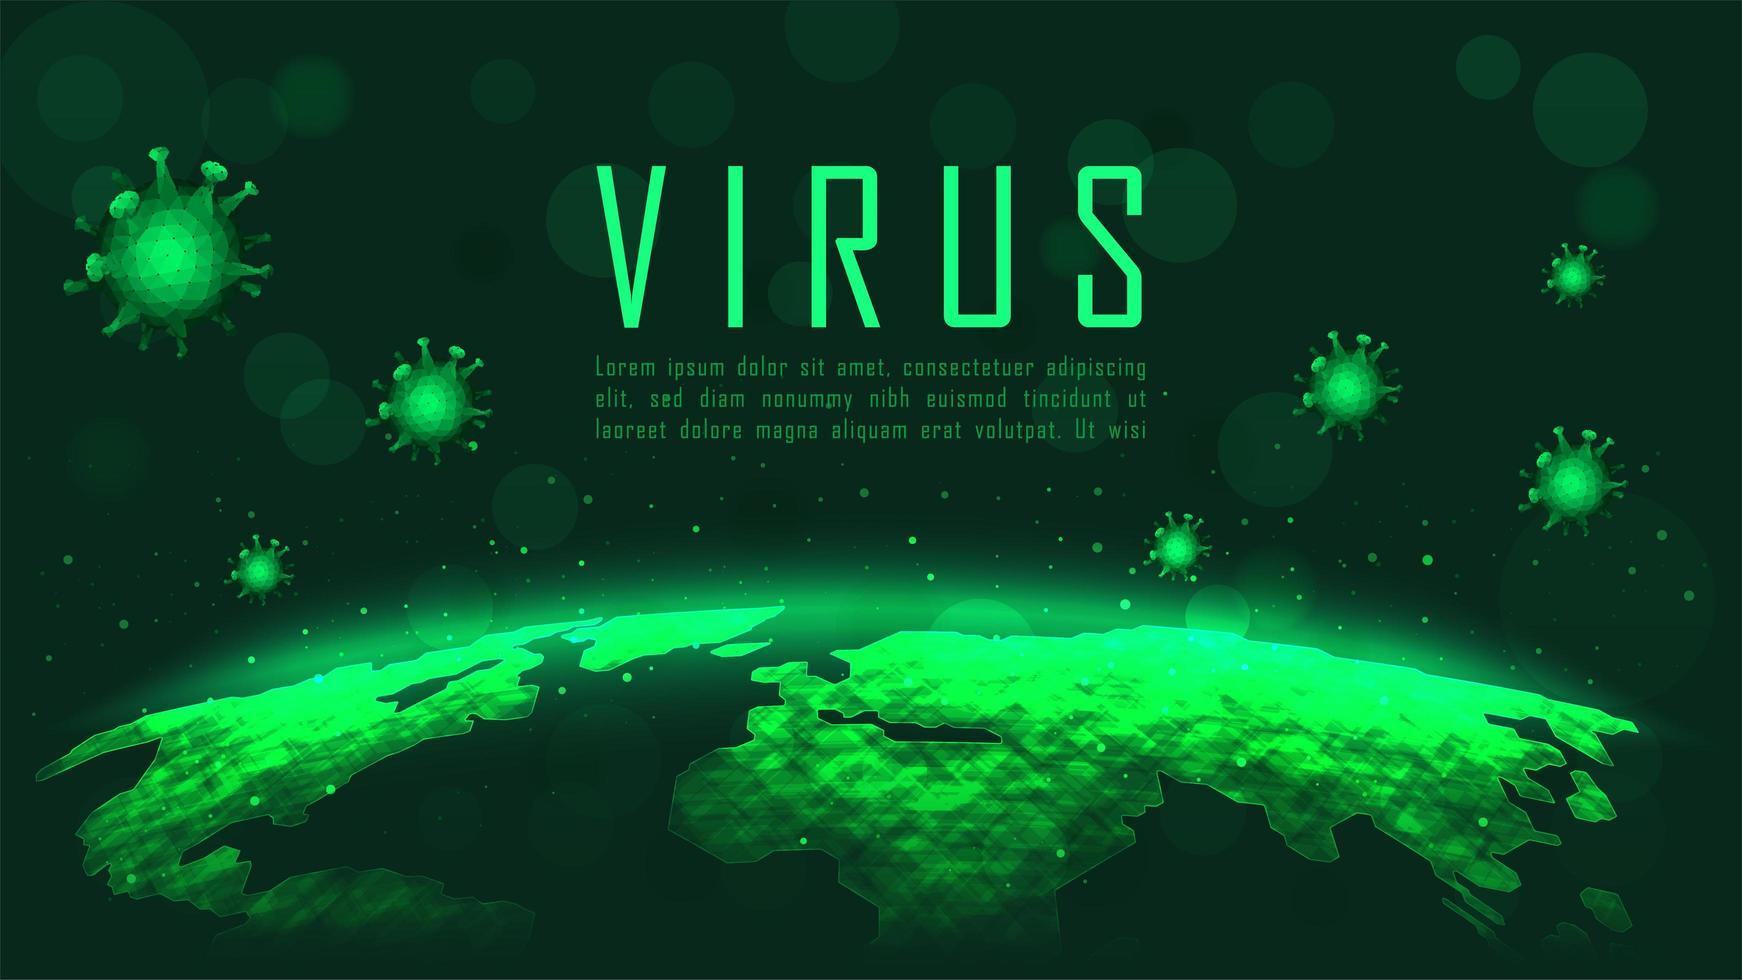 pandemia global do coronavírus verde vetor